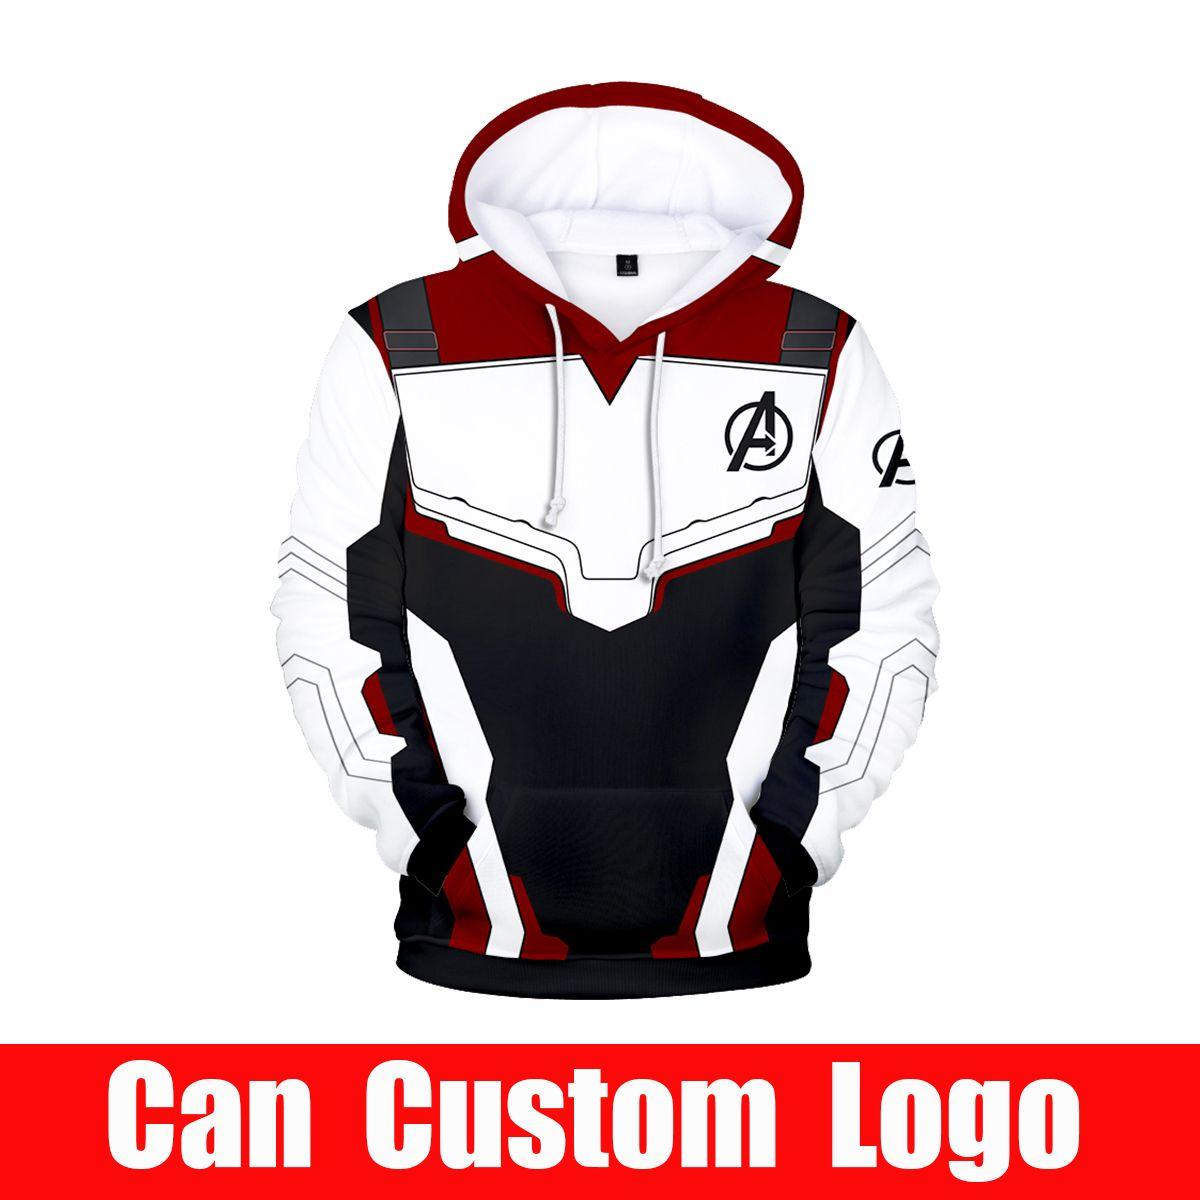 Avengers Endgame Quantum Realm Sweatshirt with hooded Advanced Tech Hoodie Cosplay Costumes 2019 new superhero Iron Man Hoodies